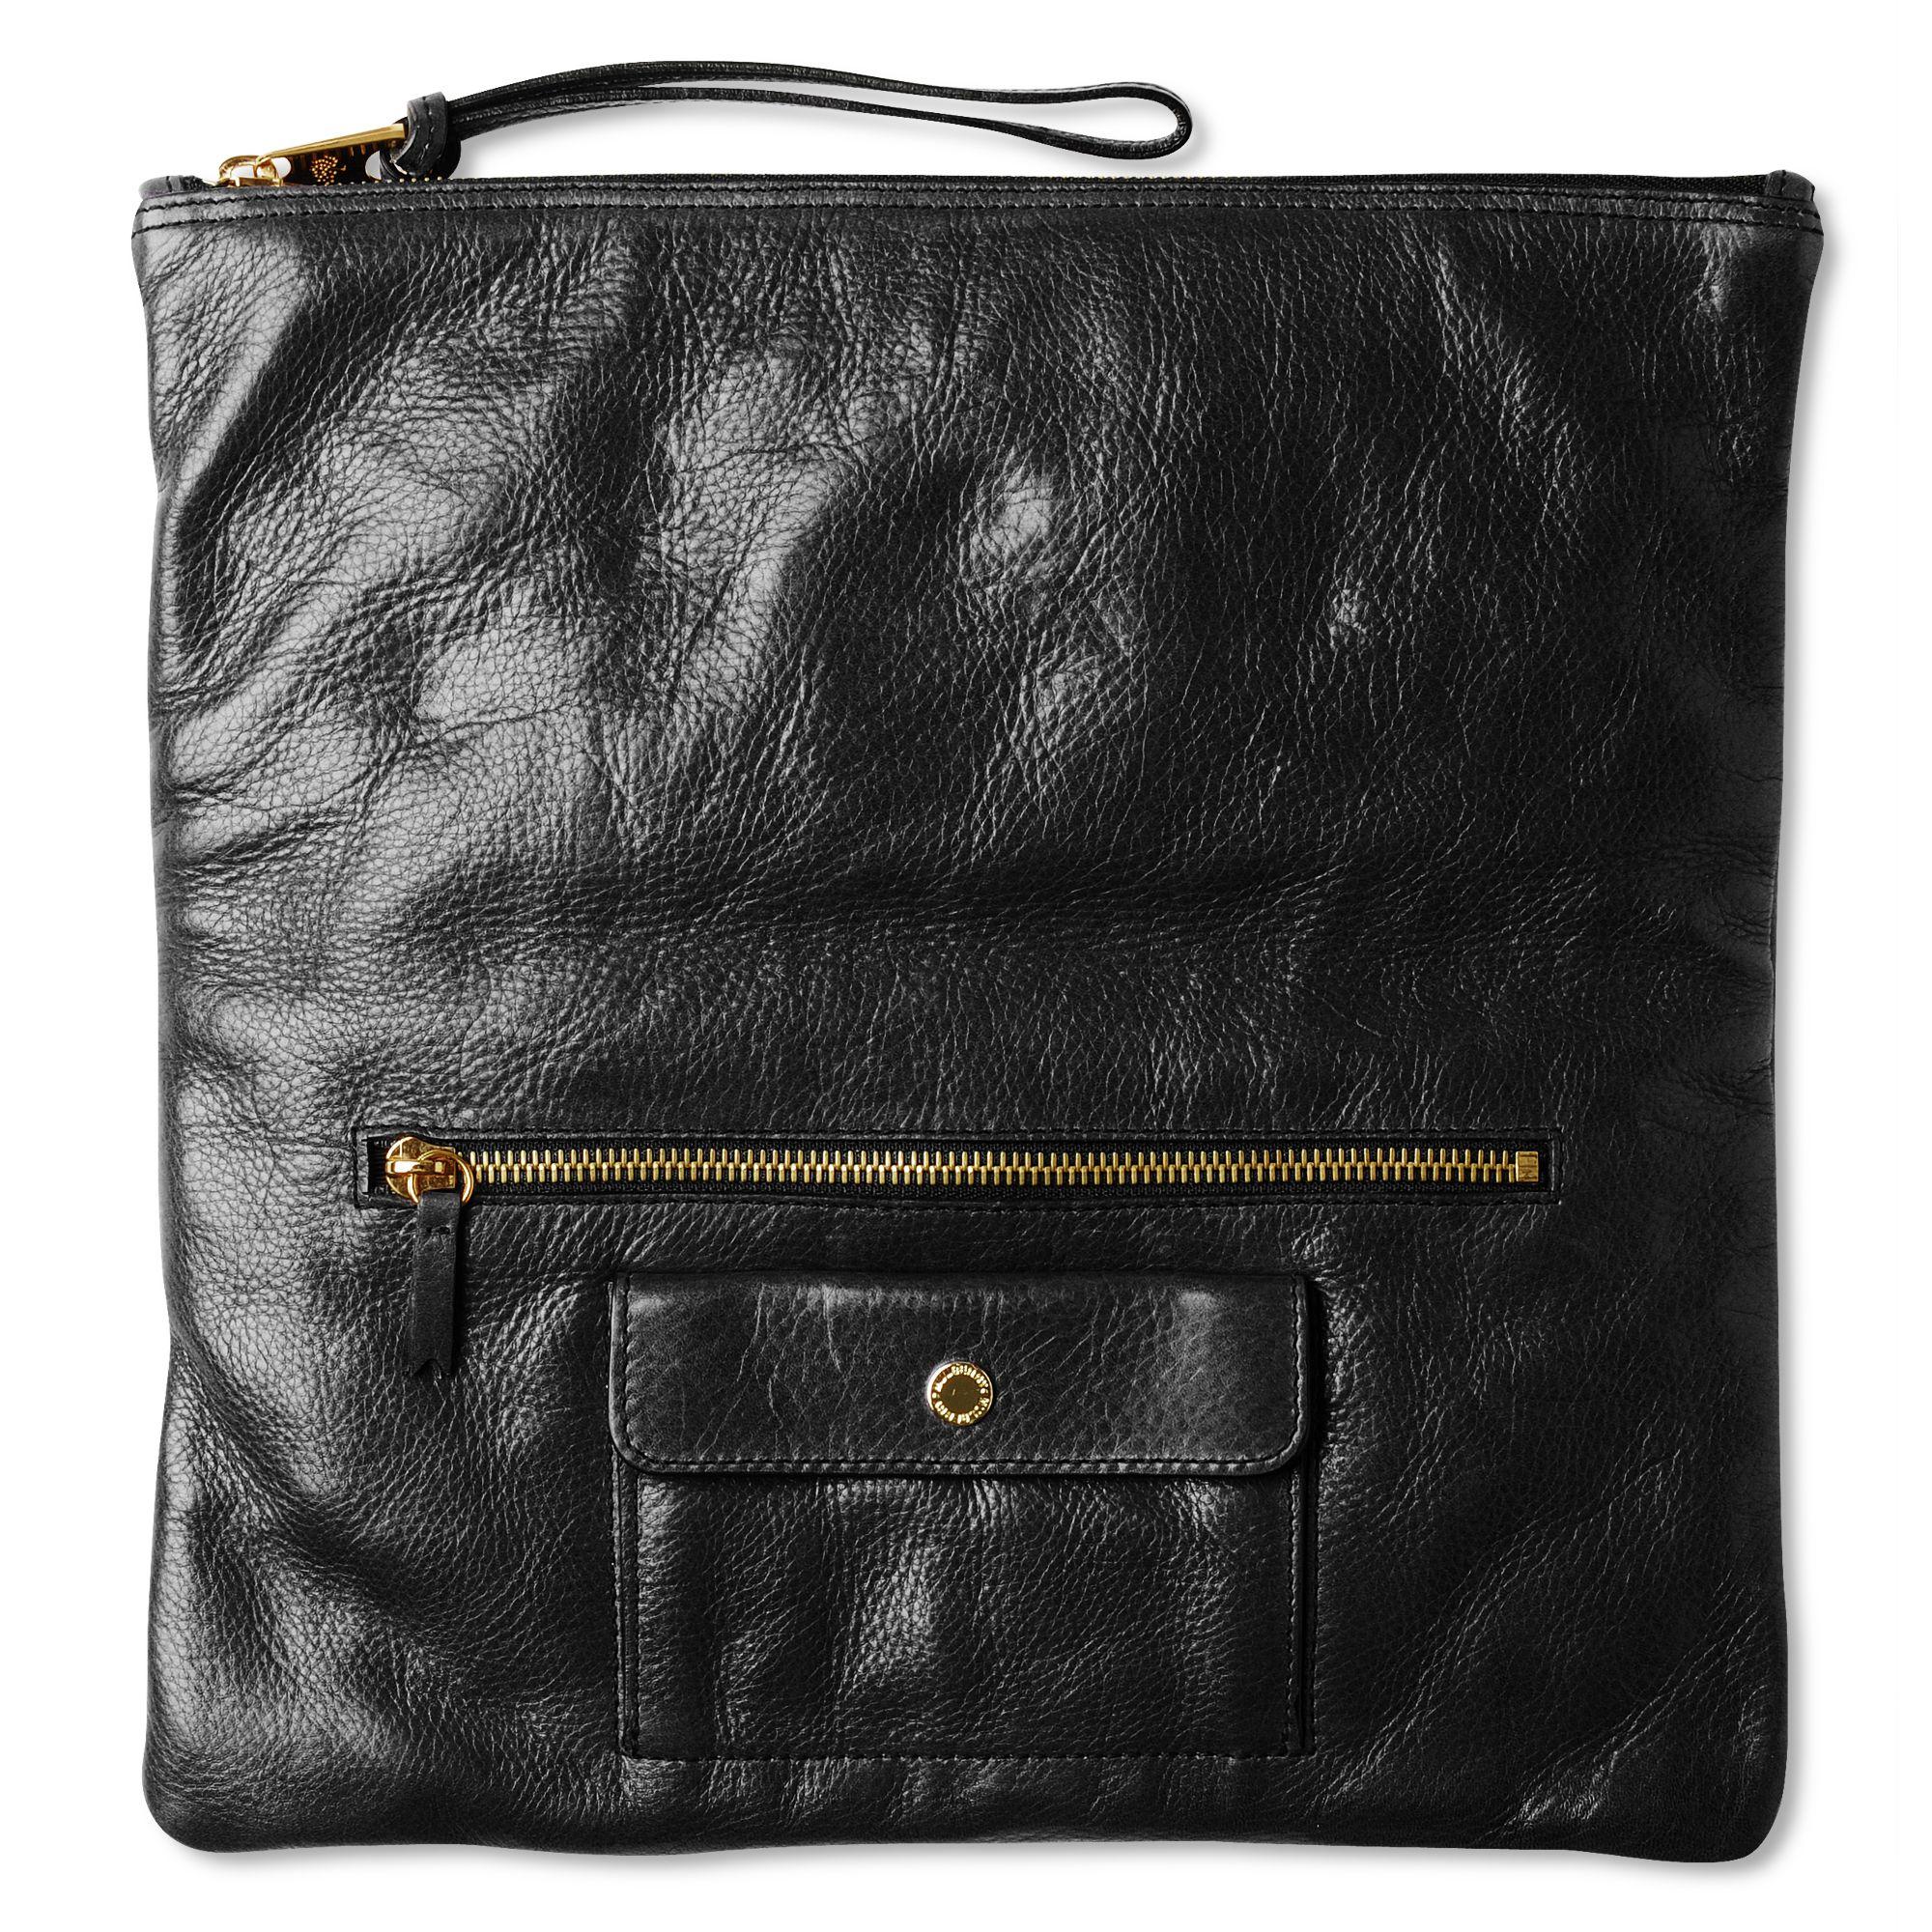 7fd6fac2fffa ... amazon mulberry daria clutch bag in black lyst 8fc91 7cb49